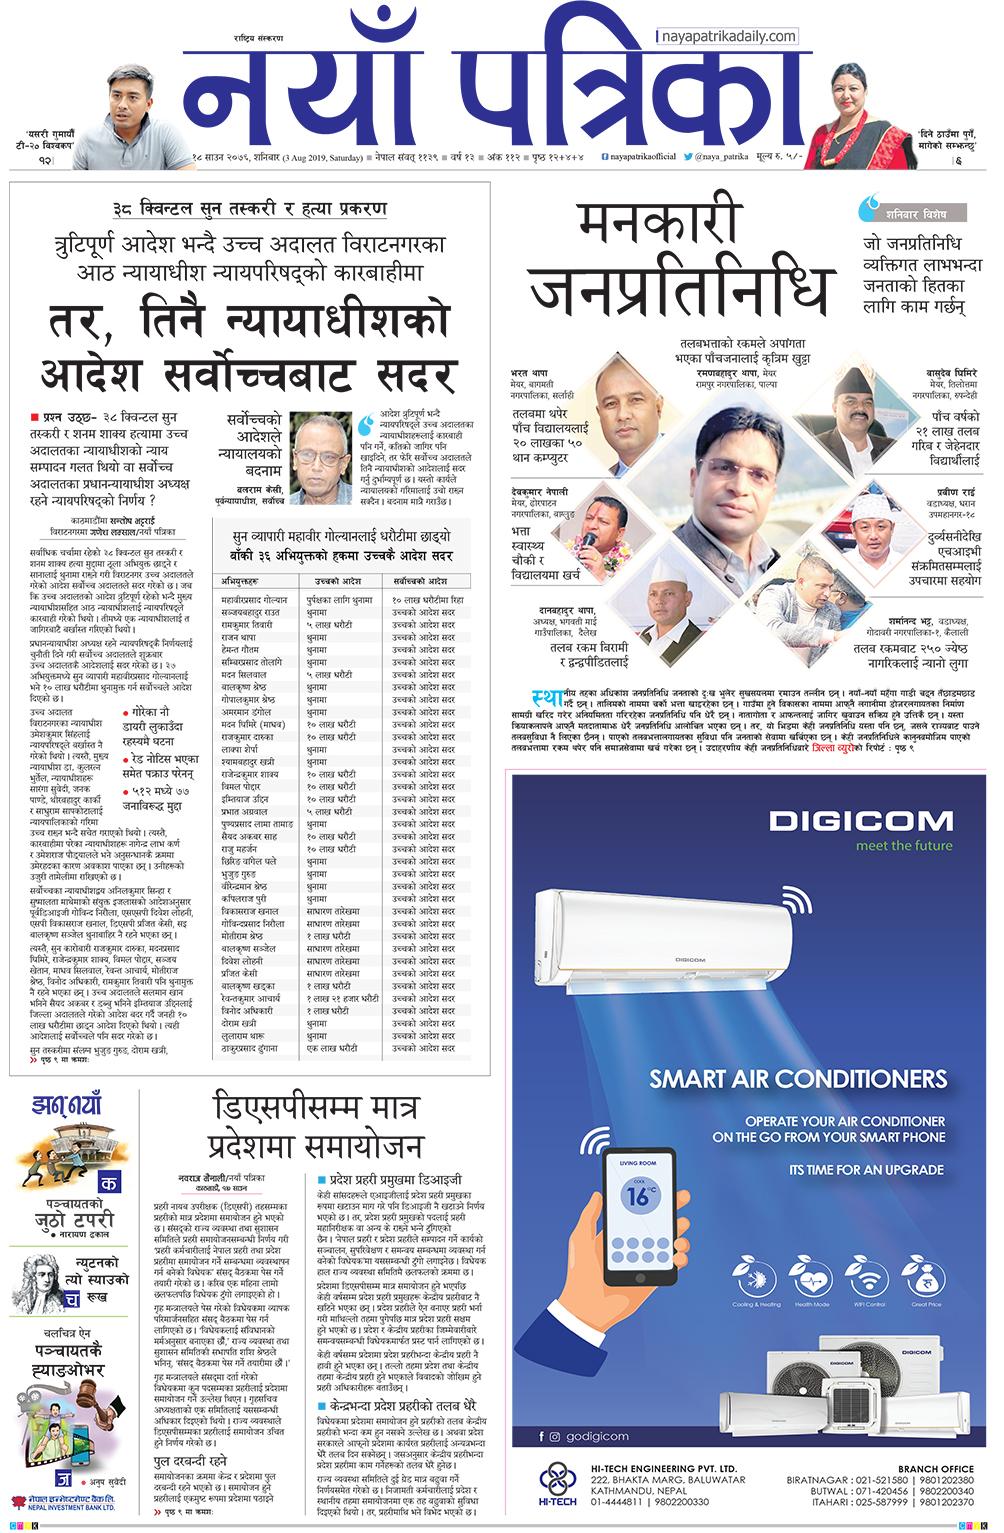 Nayapatrika Daily